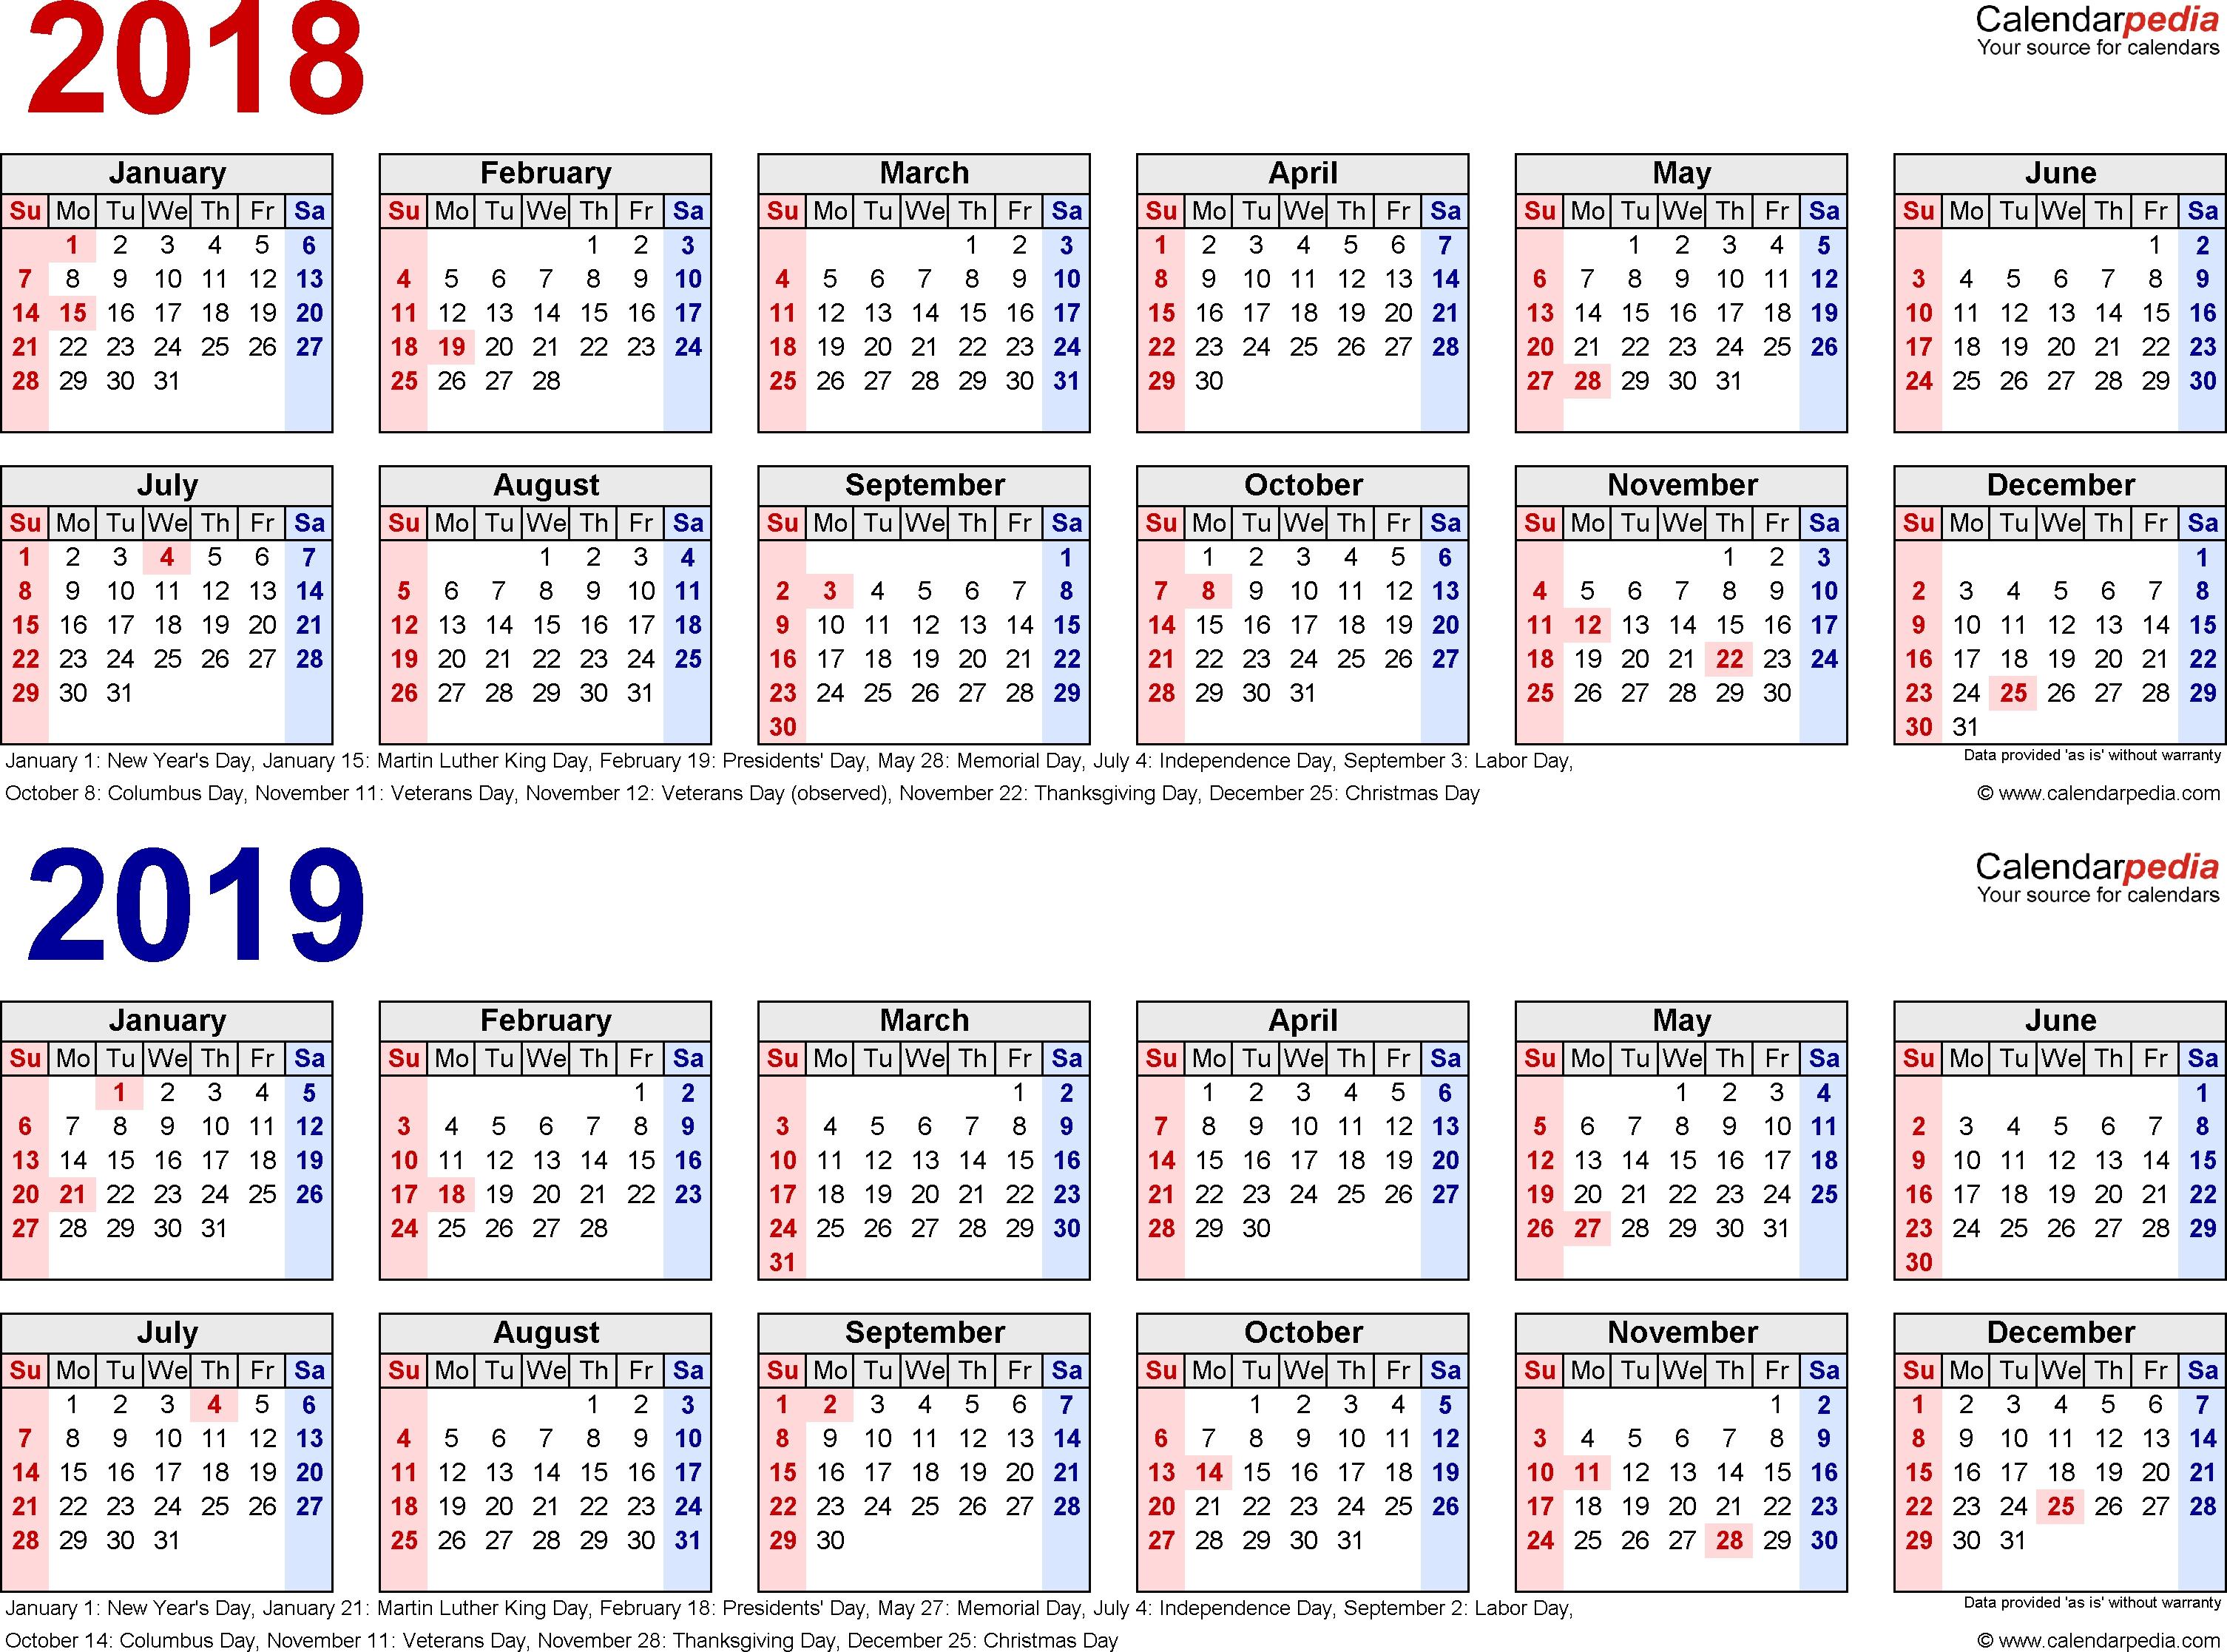 Image Result For Free Printable 2018 /2019 Calendar | Printable Calendar 2019 Za Printanje